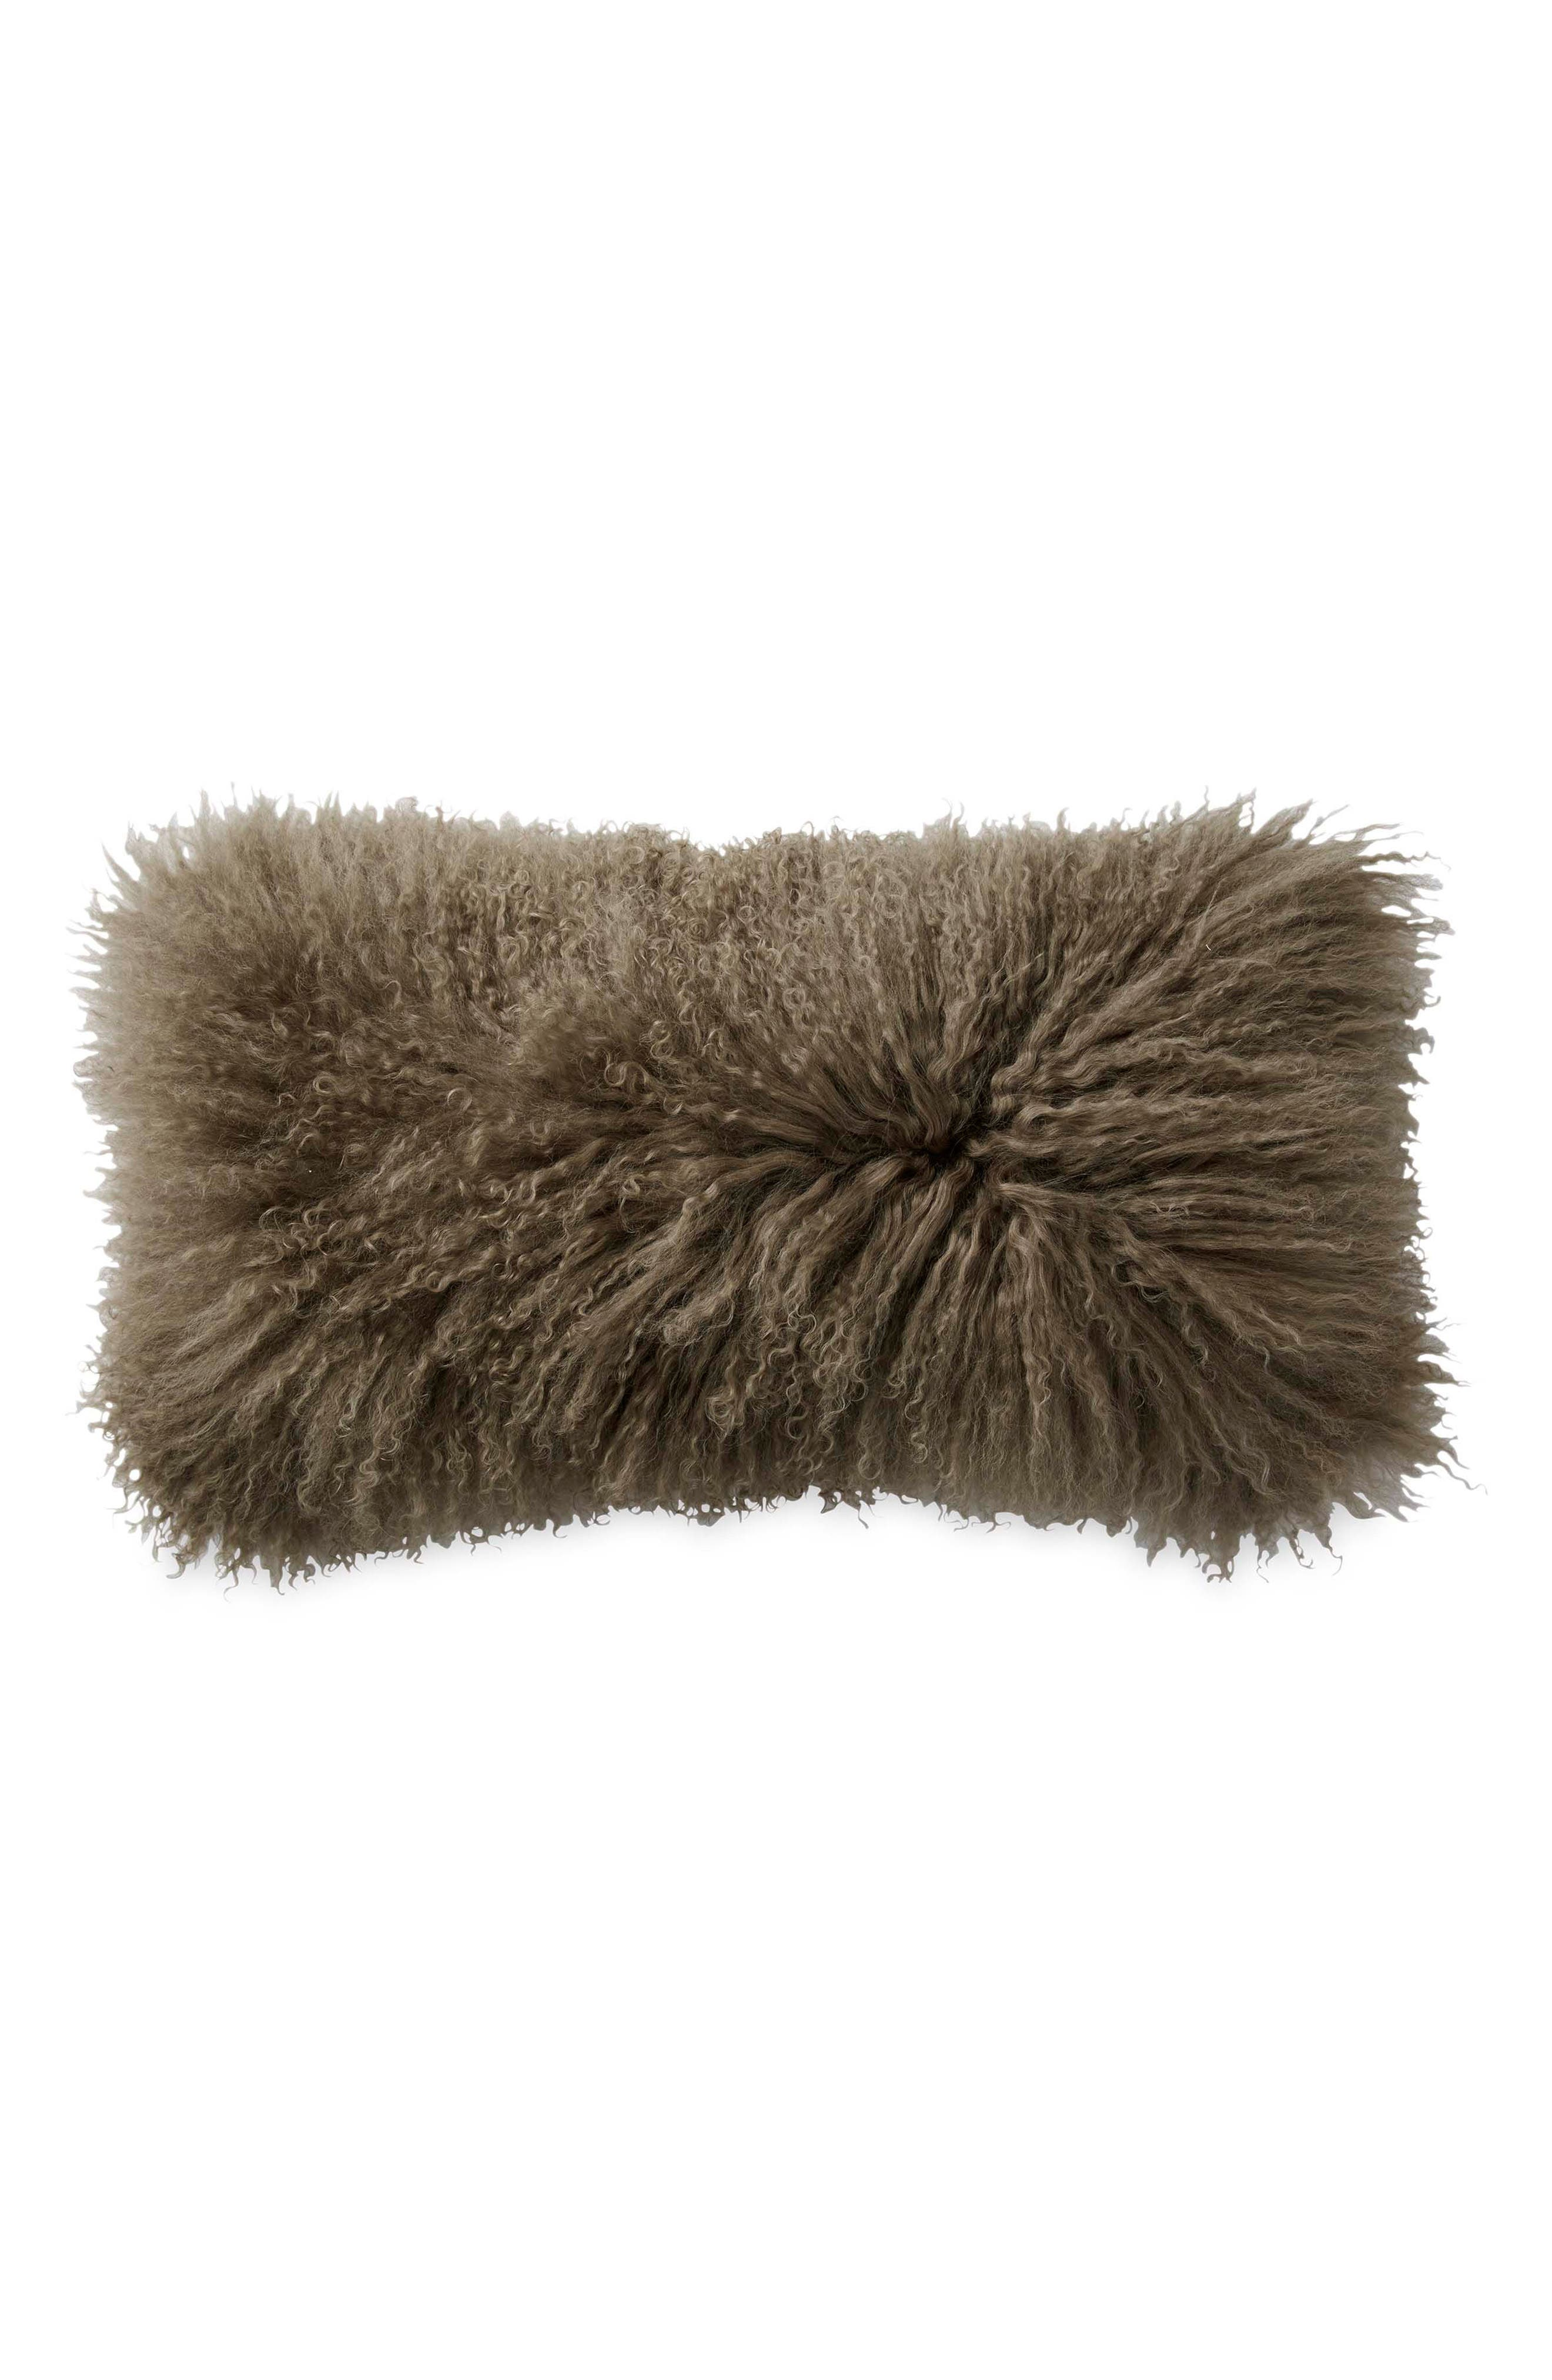 Exhale Flokati Genuine Sheepskin Pillow,                         Main,                         color, Taupe